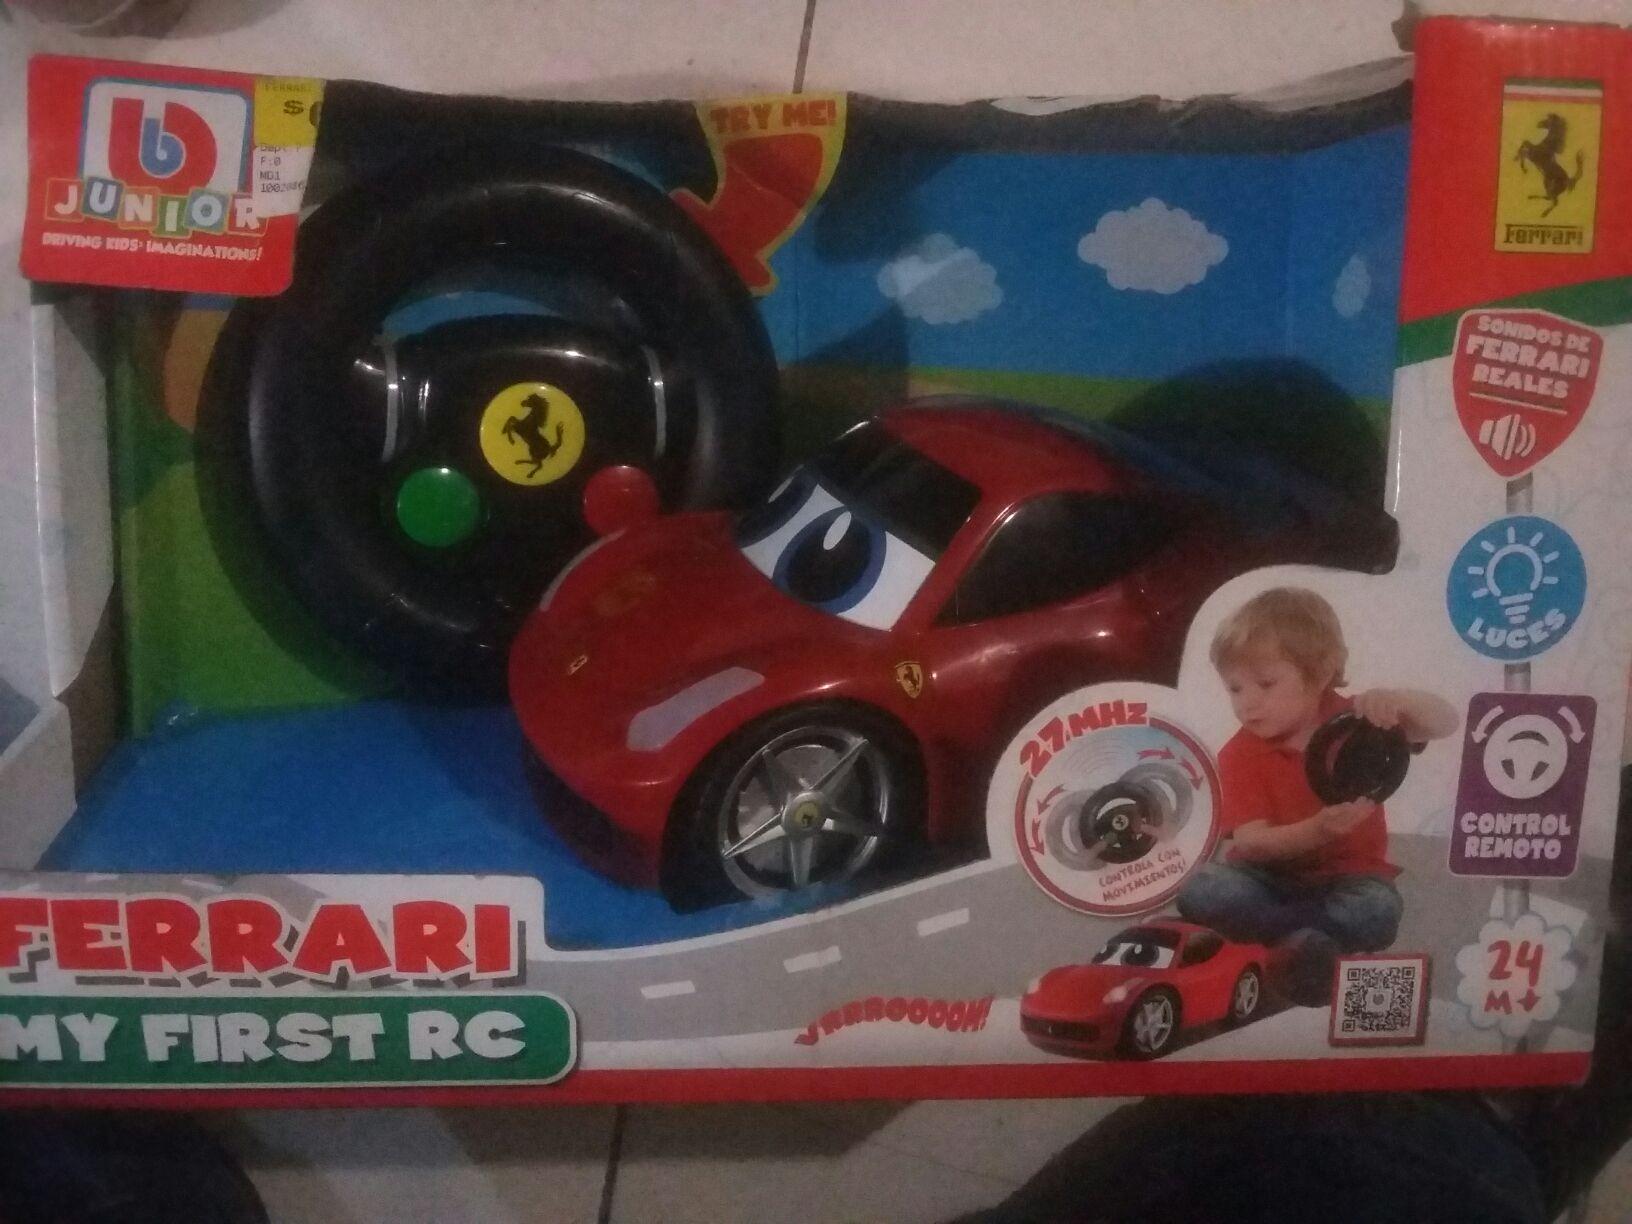 Walmart. Ferrari my firts rc de 699.03 a 244.03